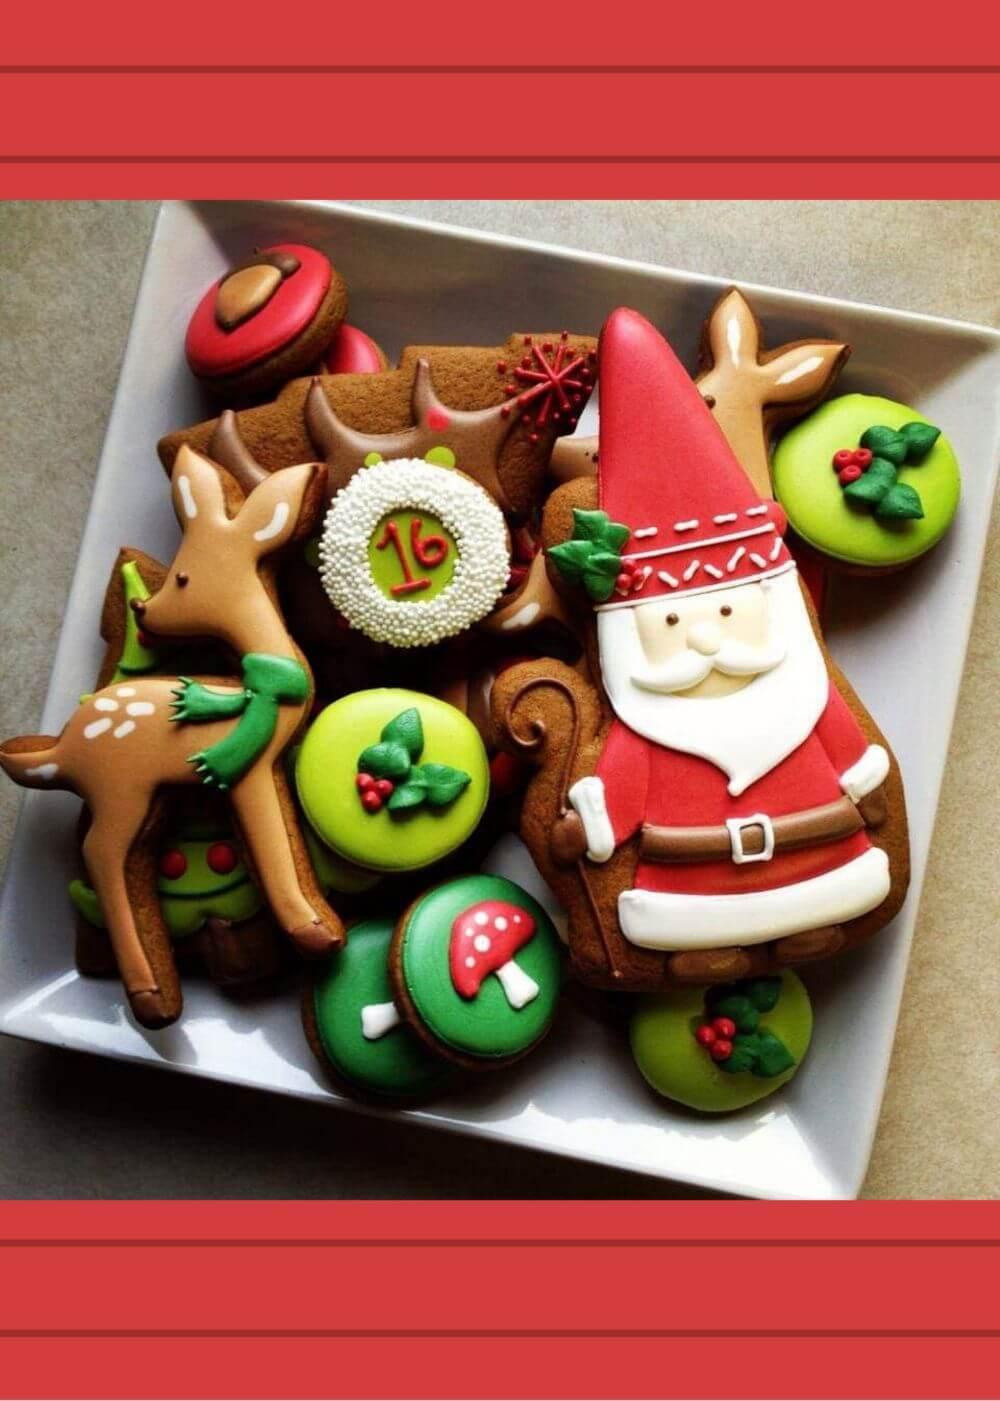 Name-Santa and Friends_Tag-Celebrations Vignettes_Season-Winter Christmas